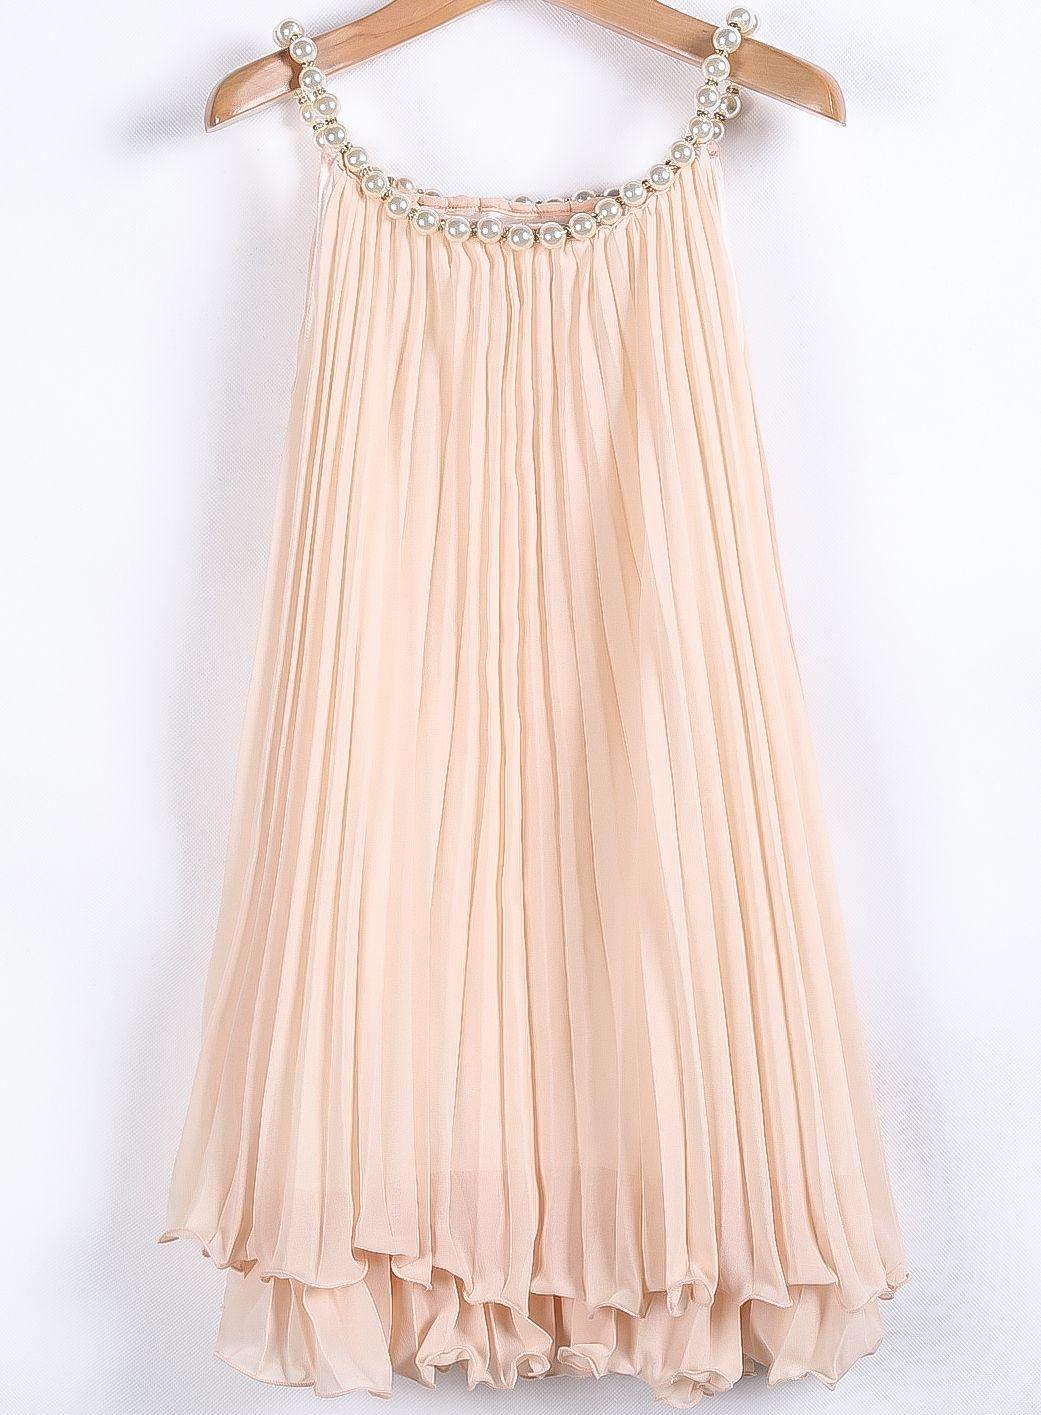 Line Sheinside Apricot Chiffon Dress Pleated En Zł72 A 37 Bead BwwI8A